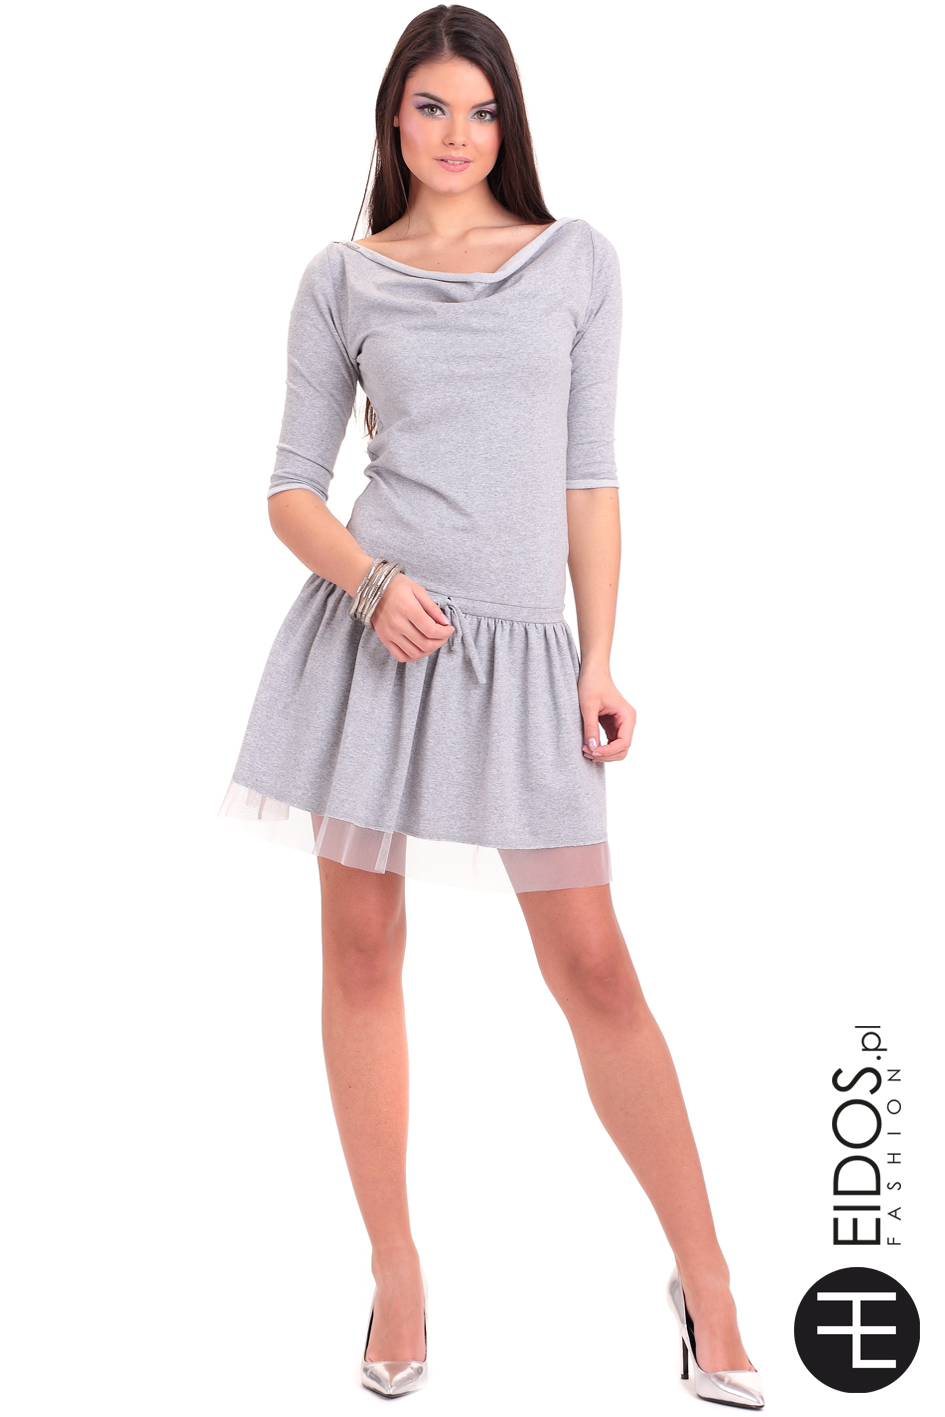 c6bed60cd3 Sukienka MARCELA SUMMER szara bawełna - EIDOS.pl